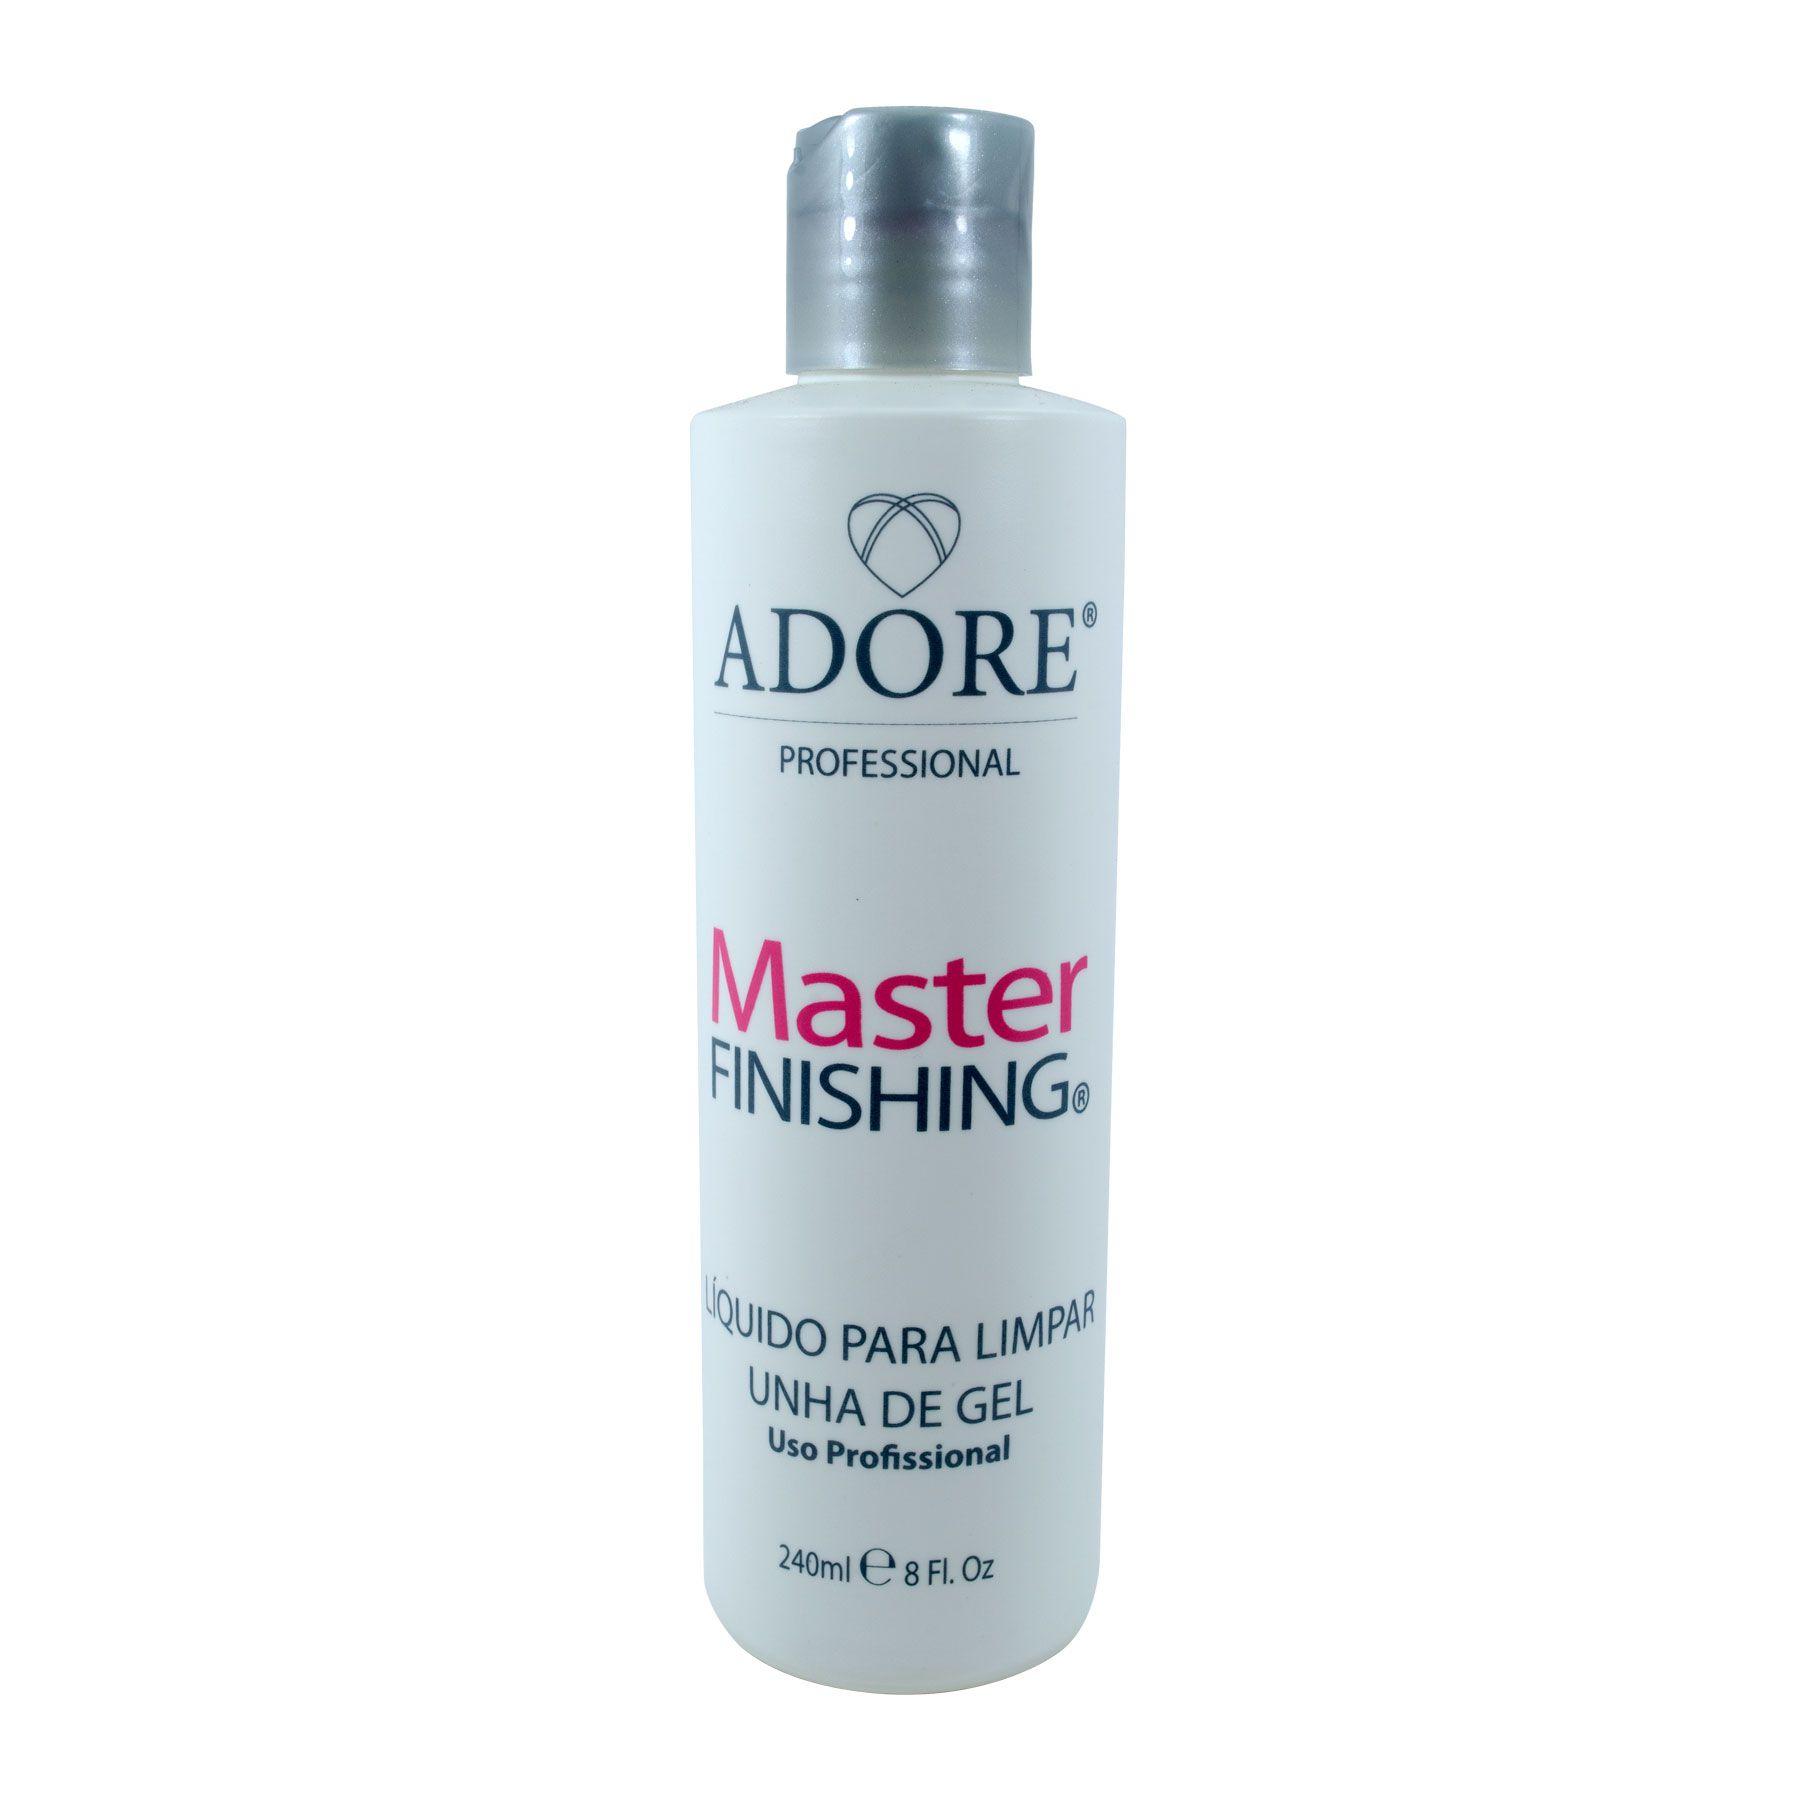 Master Finishing Adore Líquido para Limpar Unhas de Gel